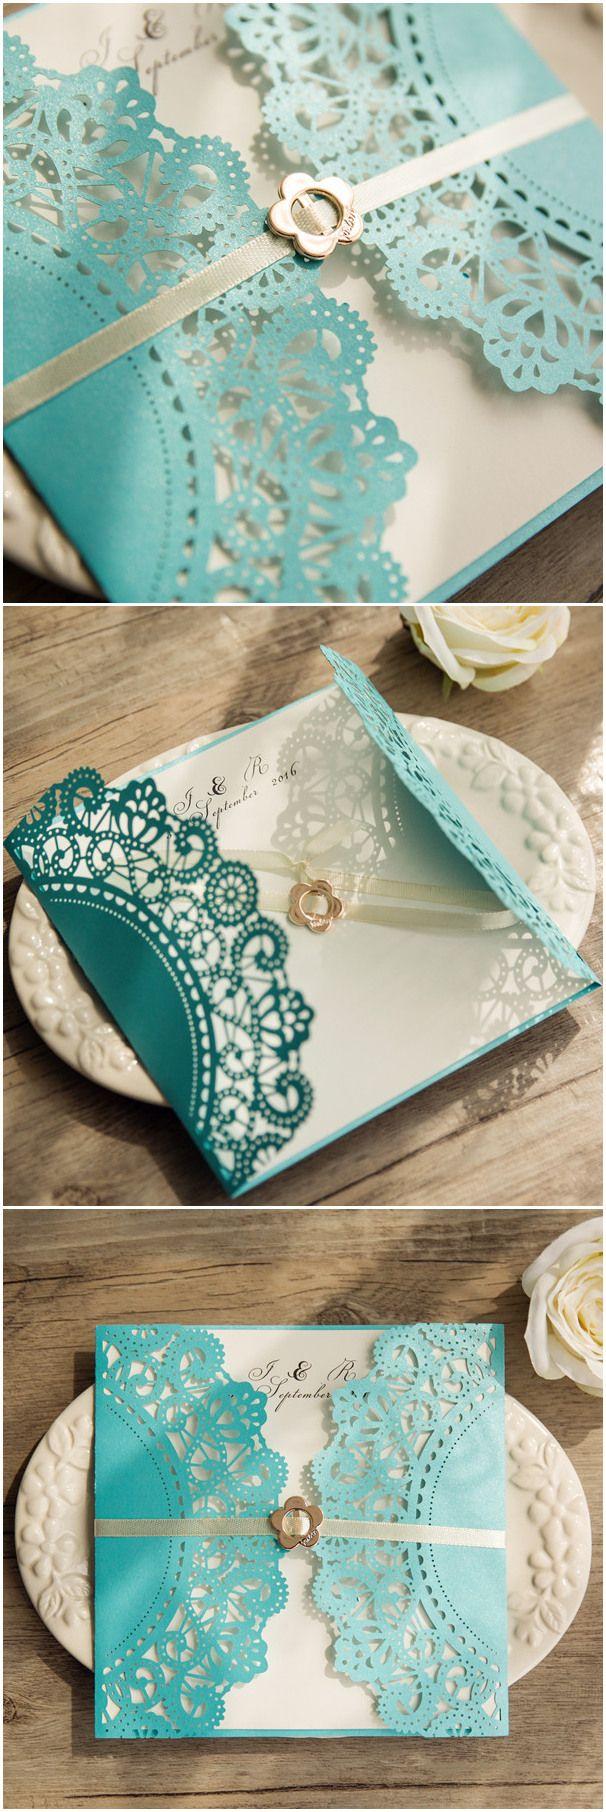 Tiffany blue themed lace design laser cut wedding invitations